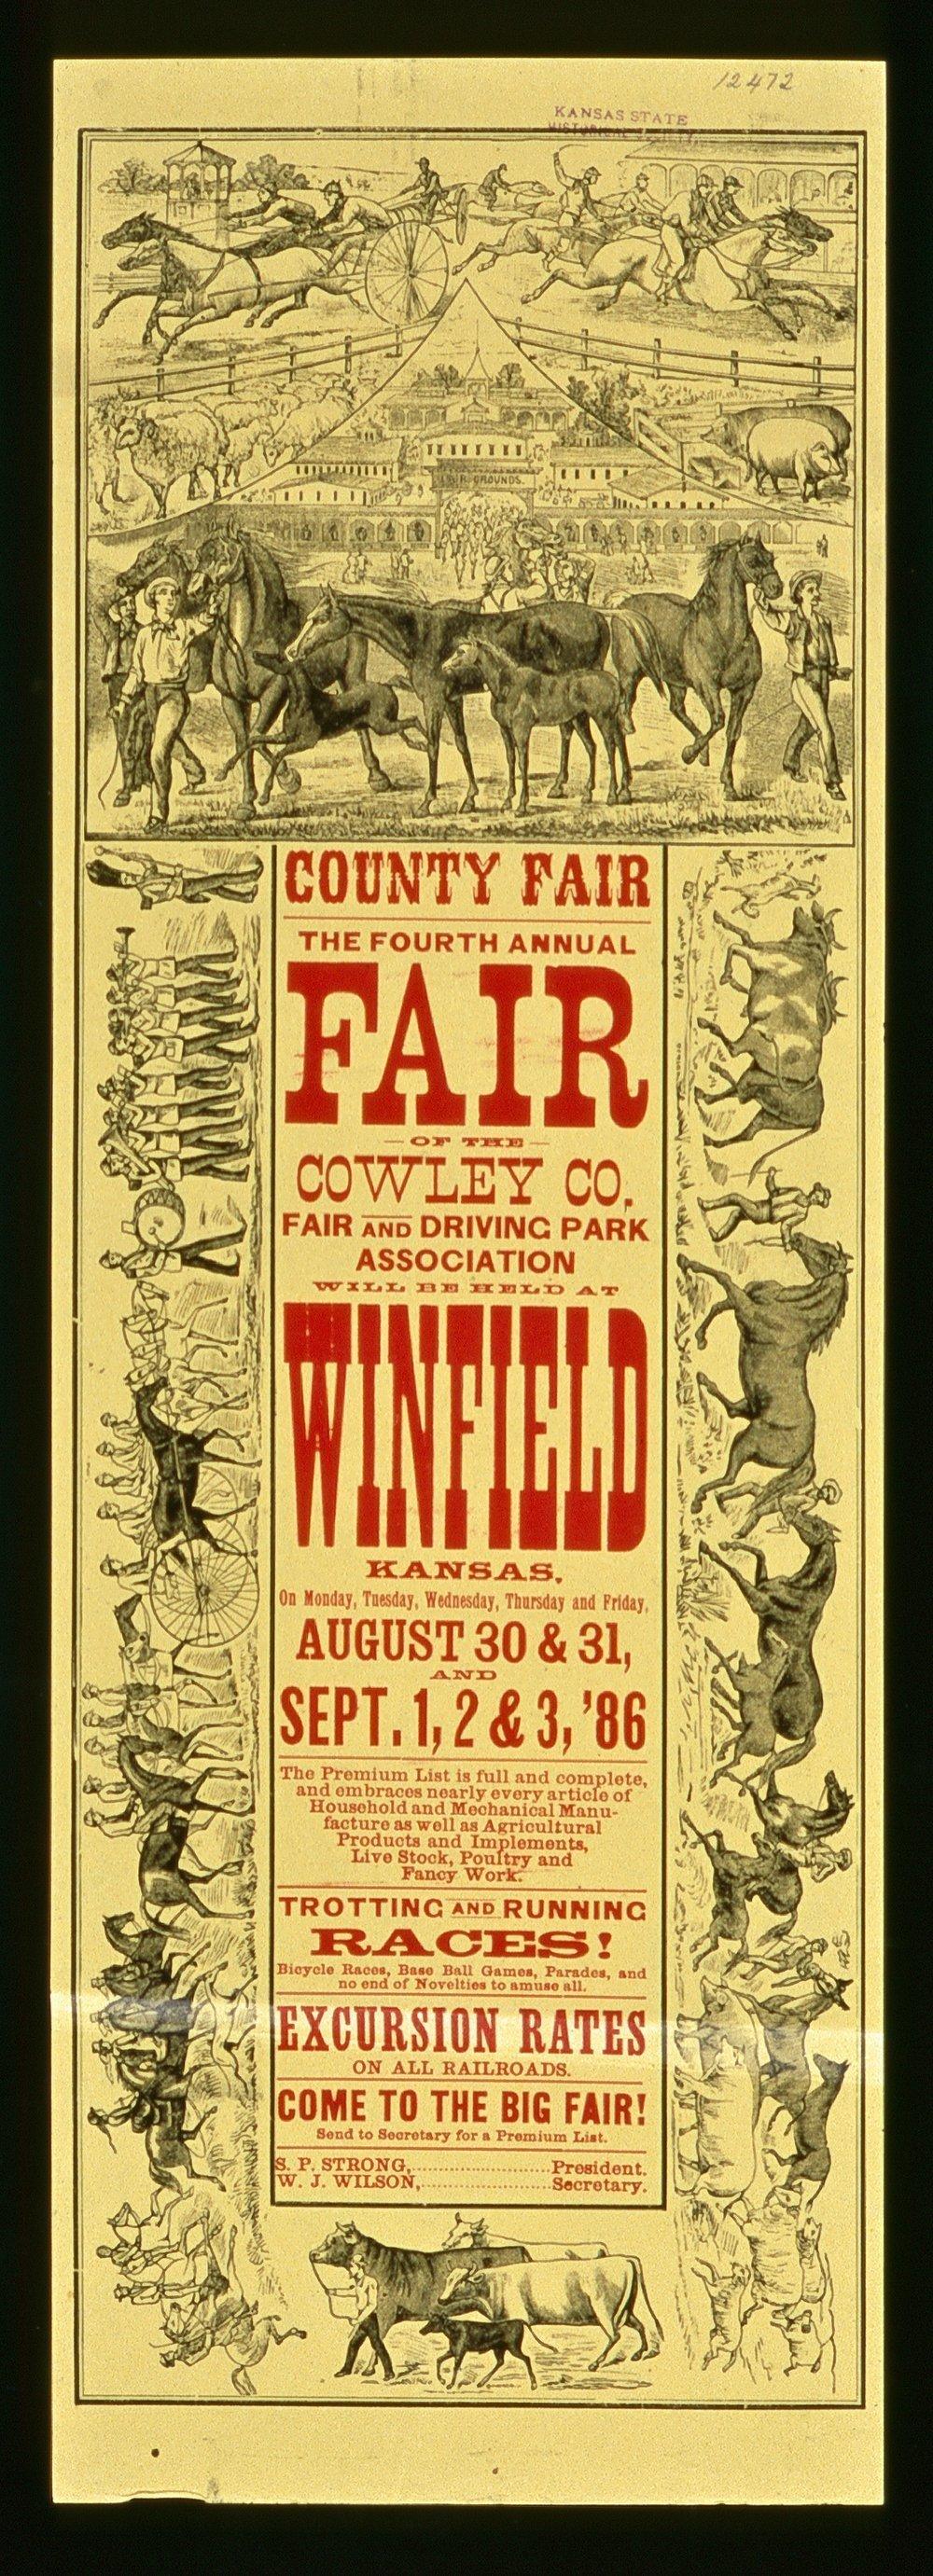 Cowley County fair